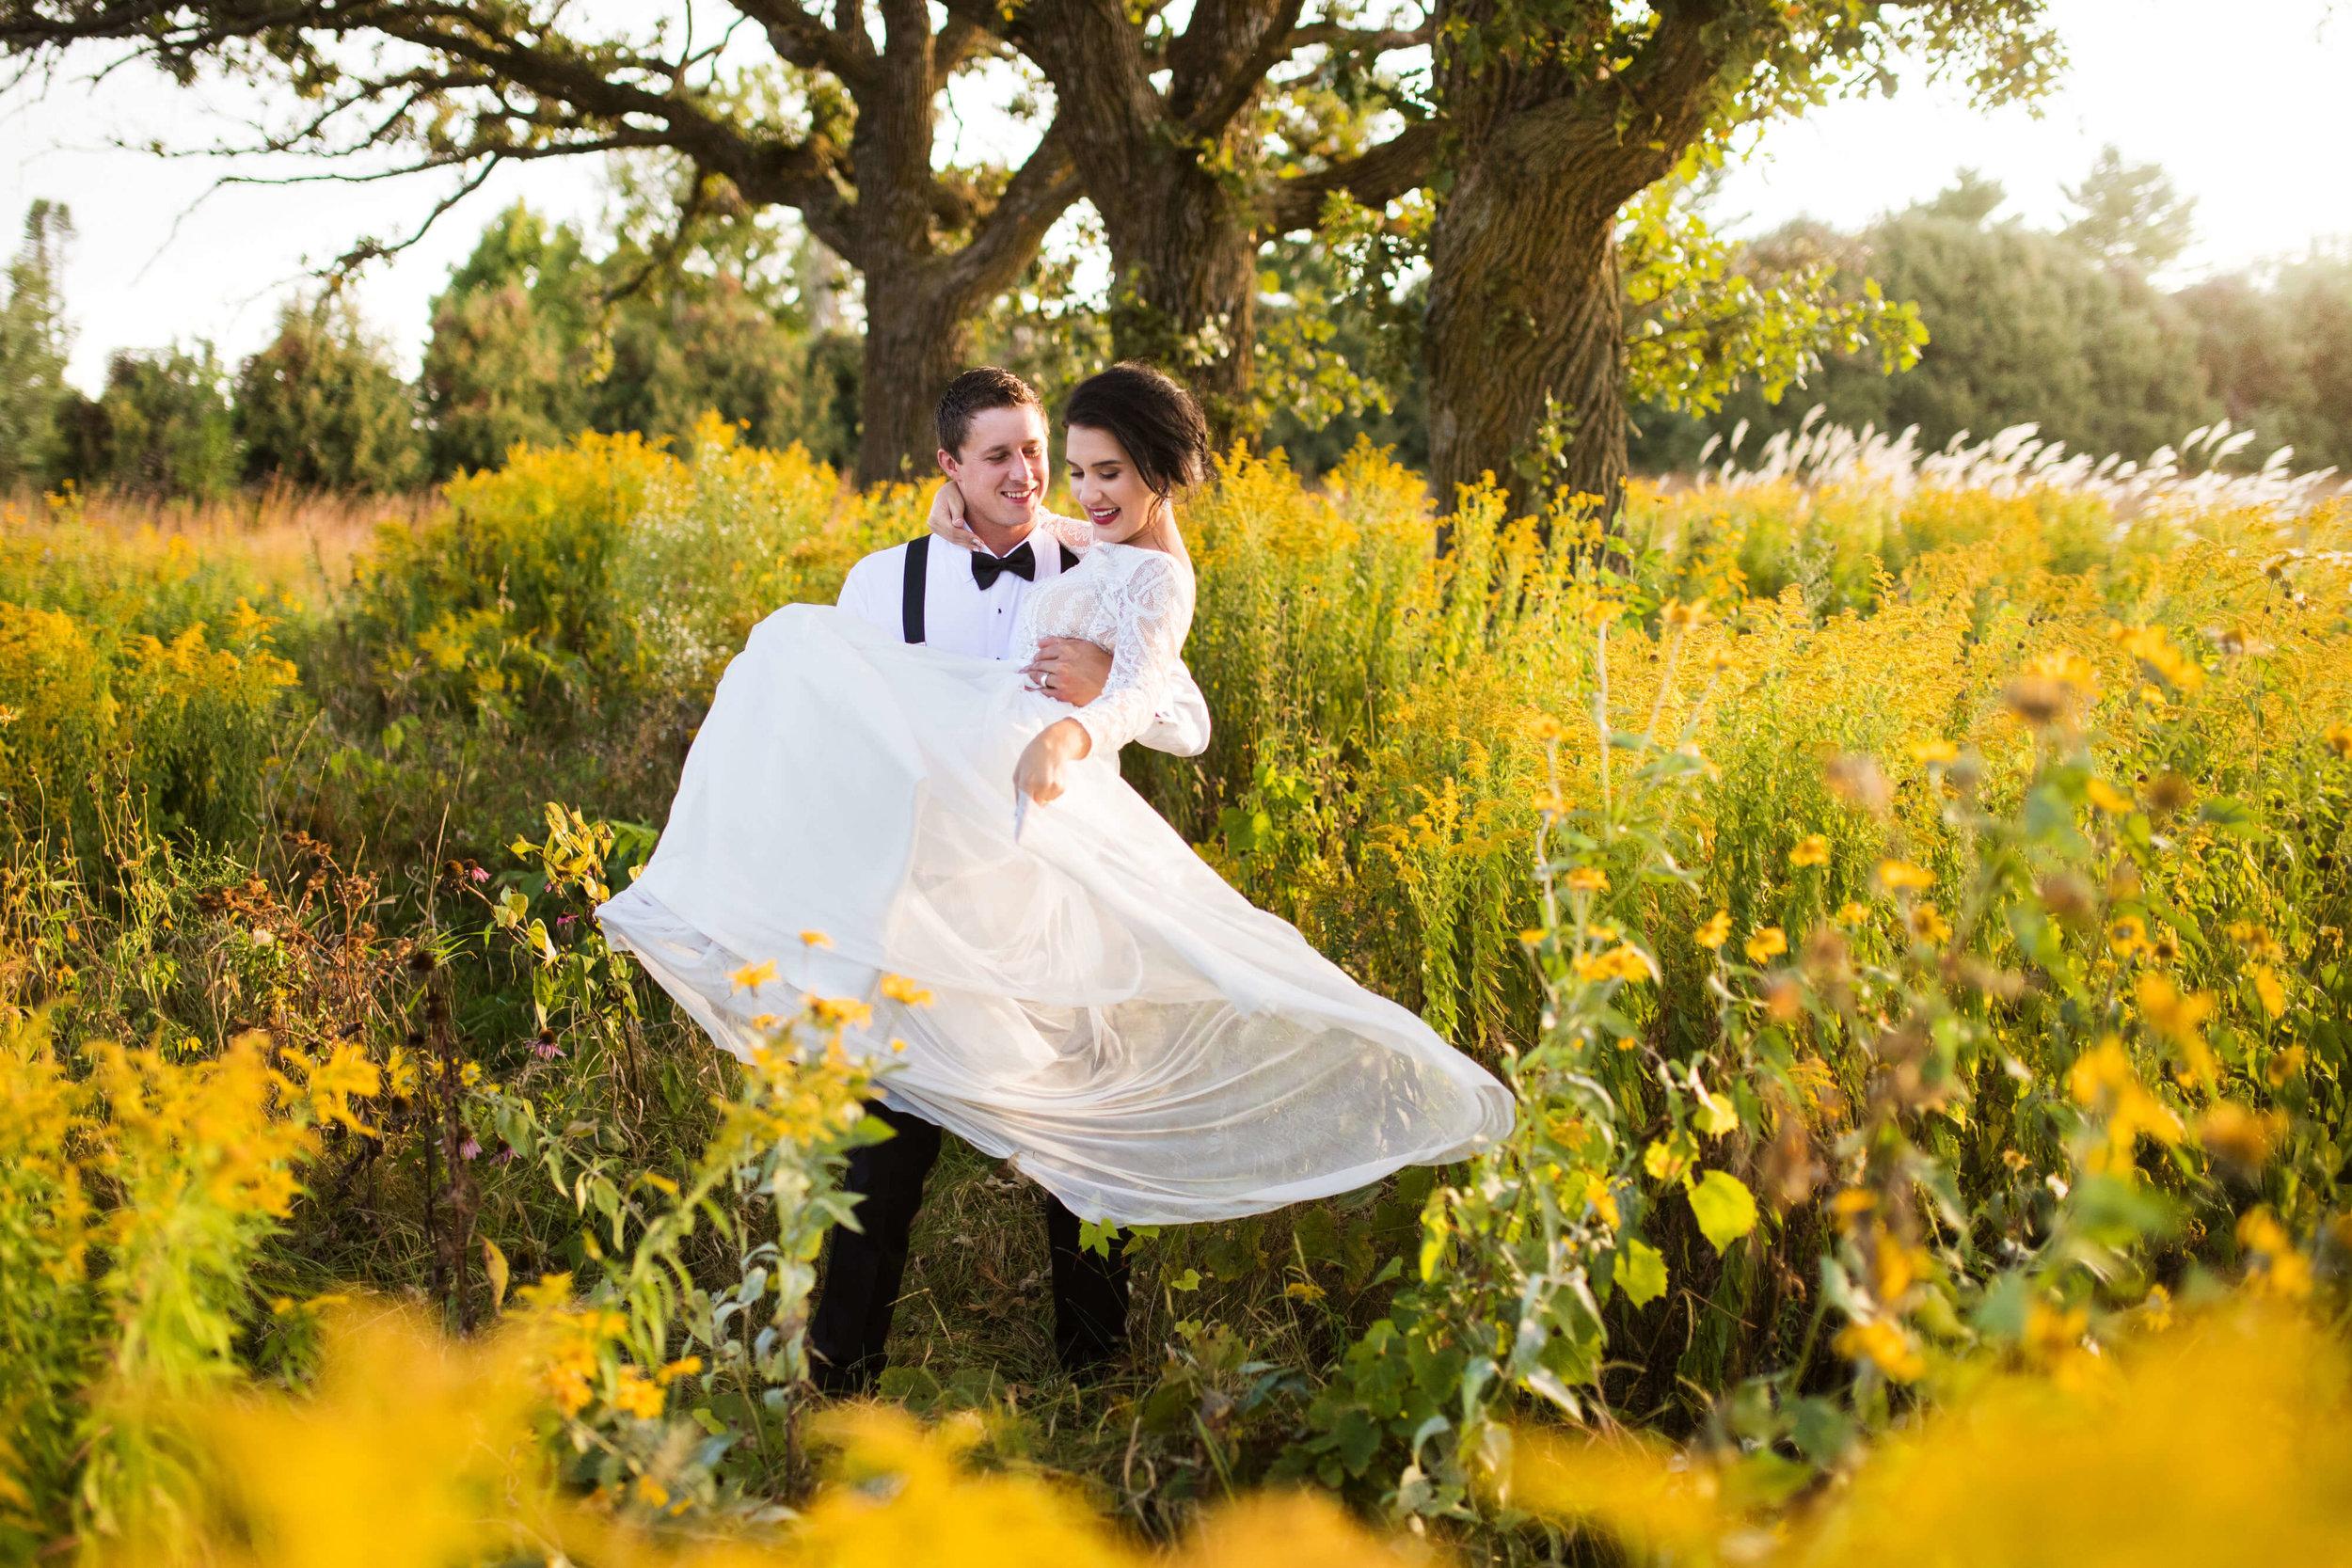 bride and groom in field of yellow | Minnesota wedding photographer Studio KH wedding dress details | wedding blog | Sixpence Events 70 Ways to Photograph Your Wedding Dress.jpg